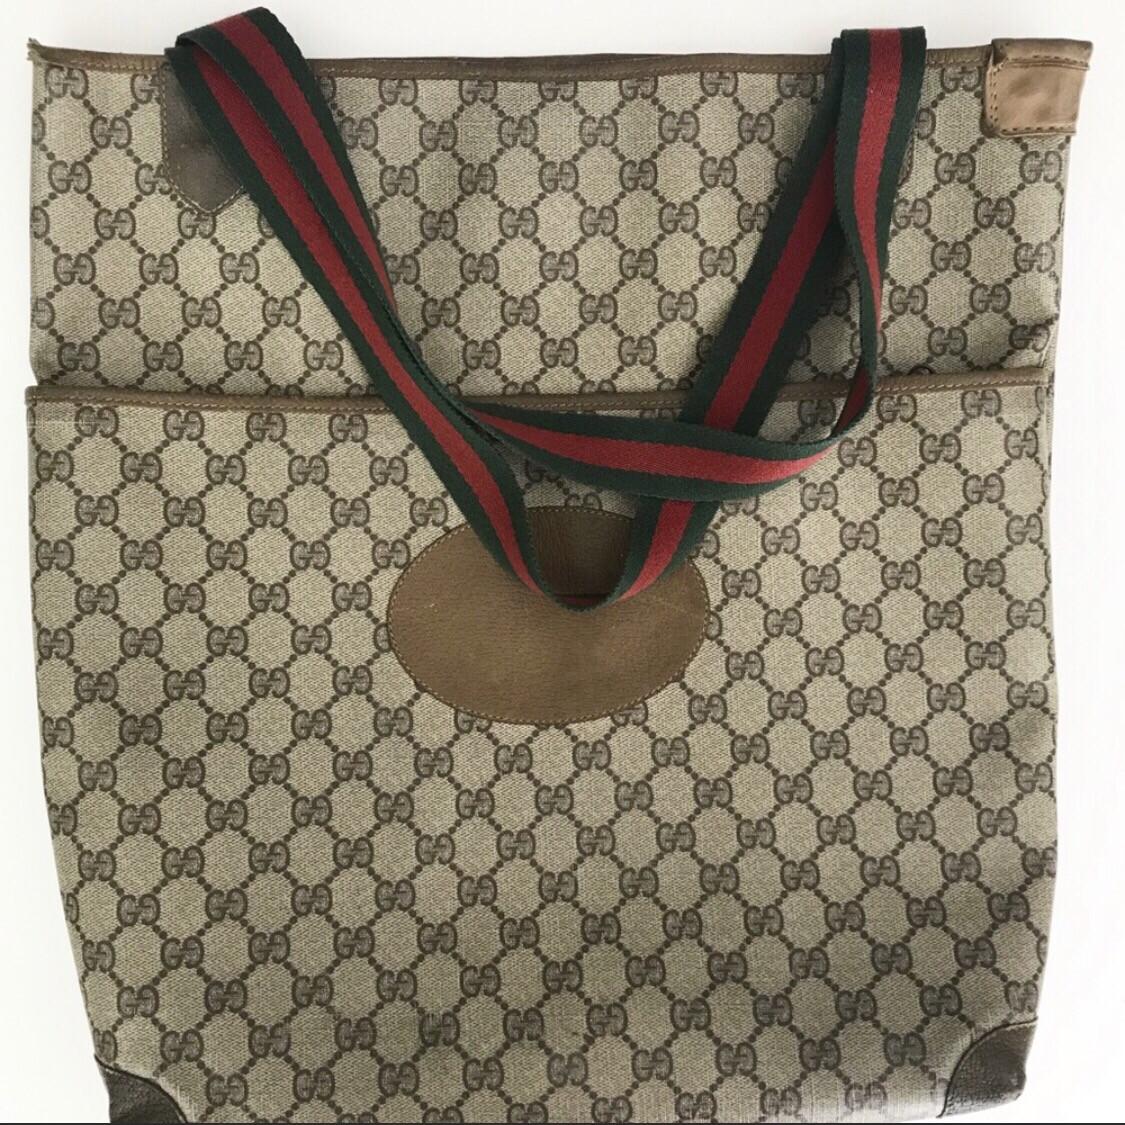 Vintage Gucci Tote W/ Front Pocket